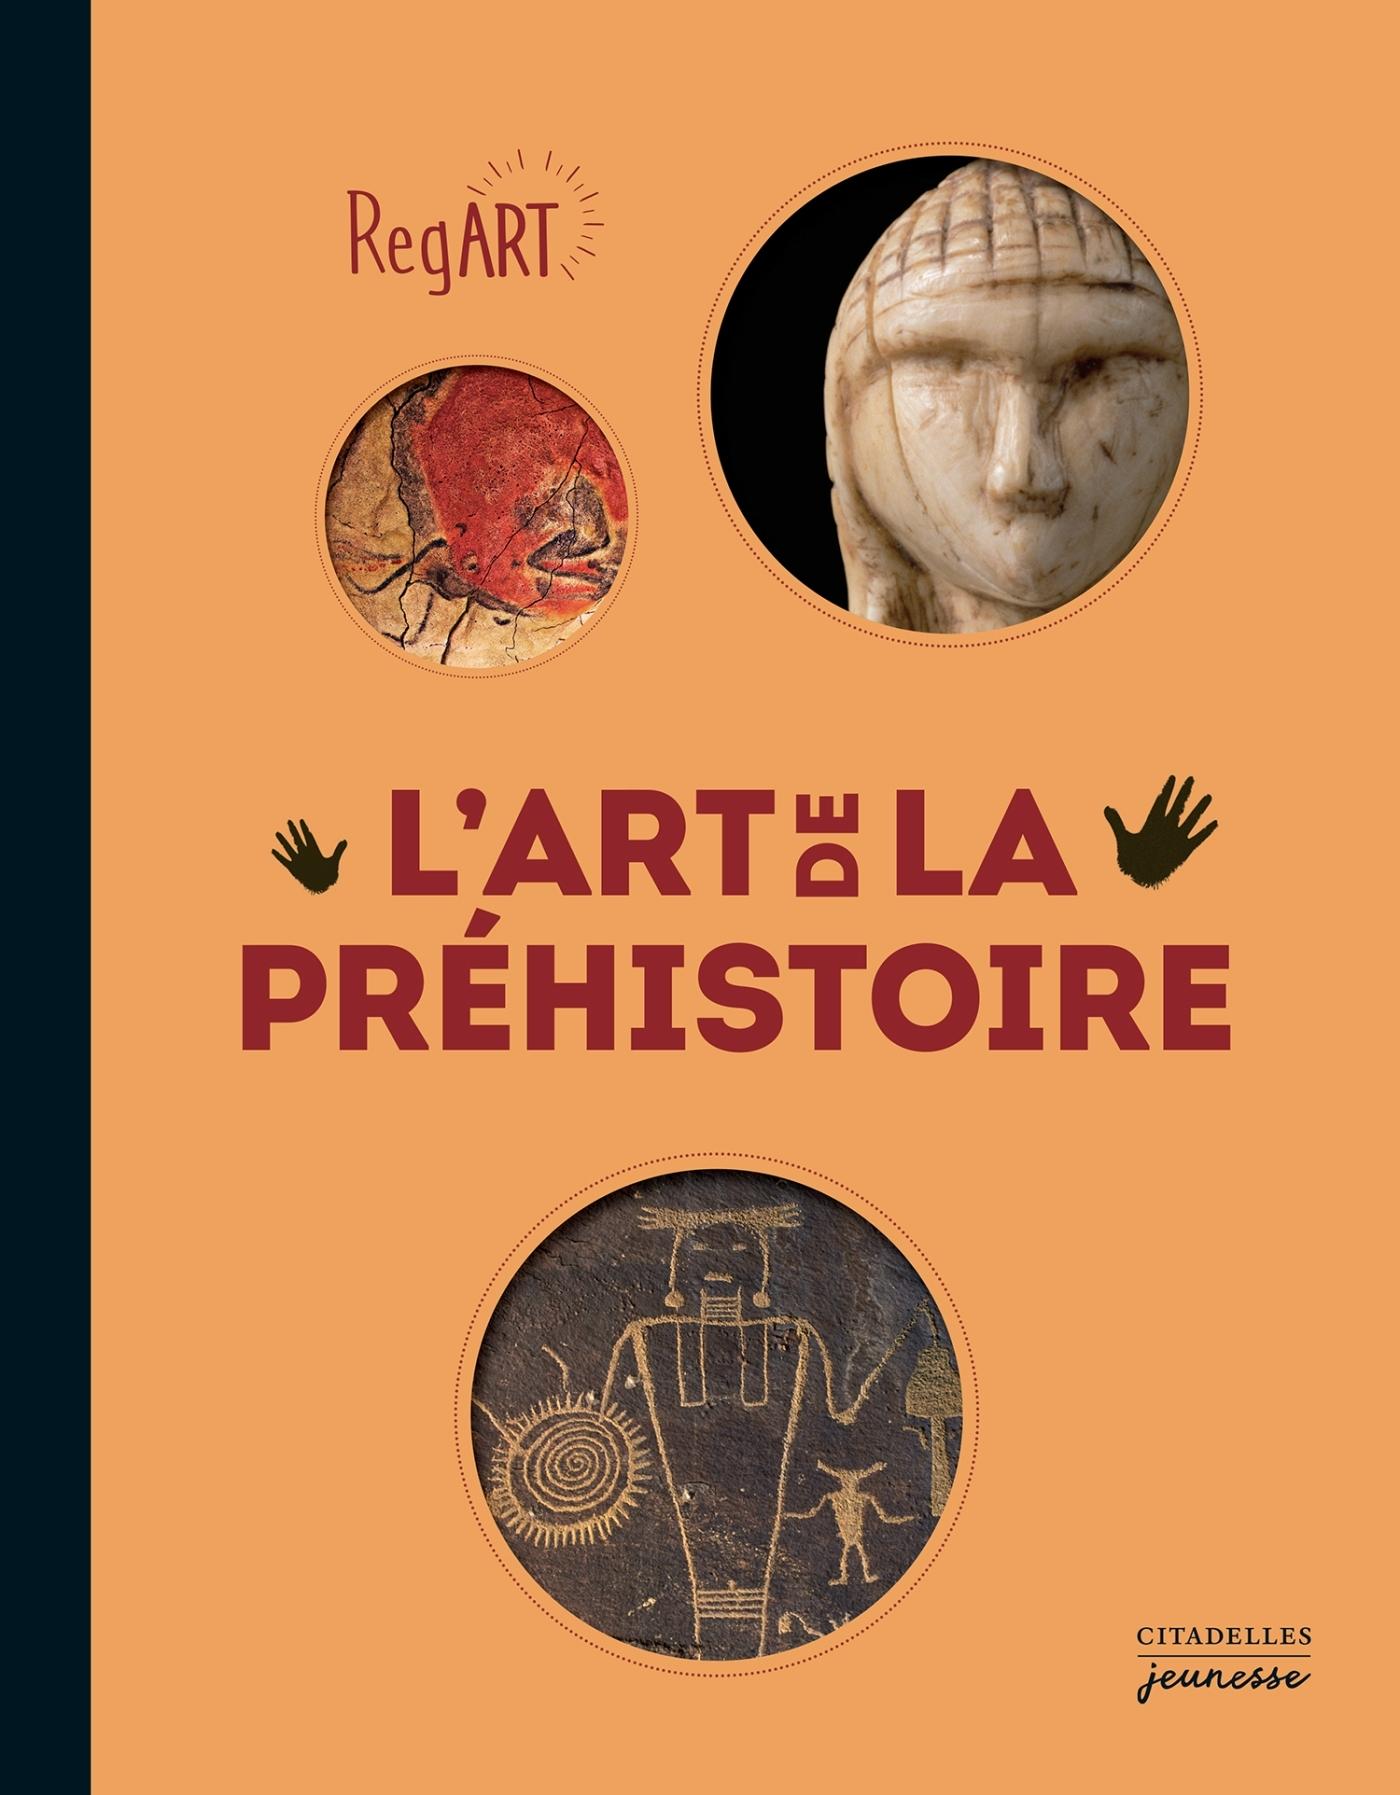 REGART - L'ART DE LA PREHISTOIRE